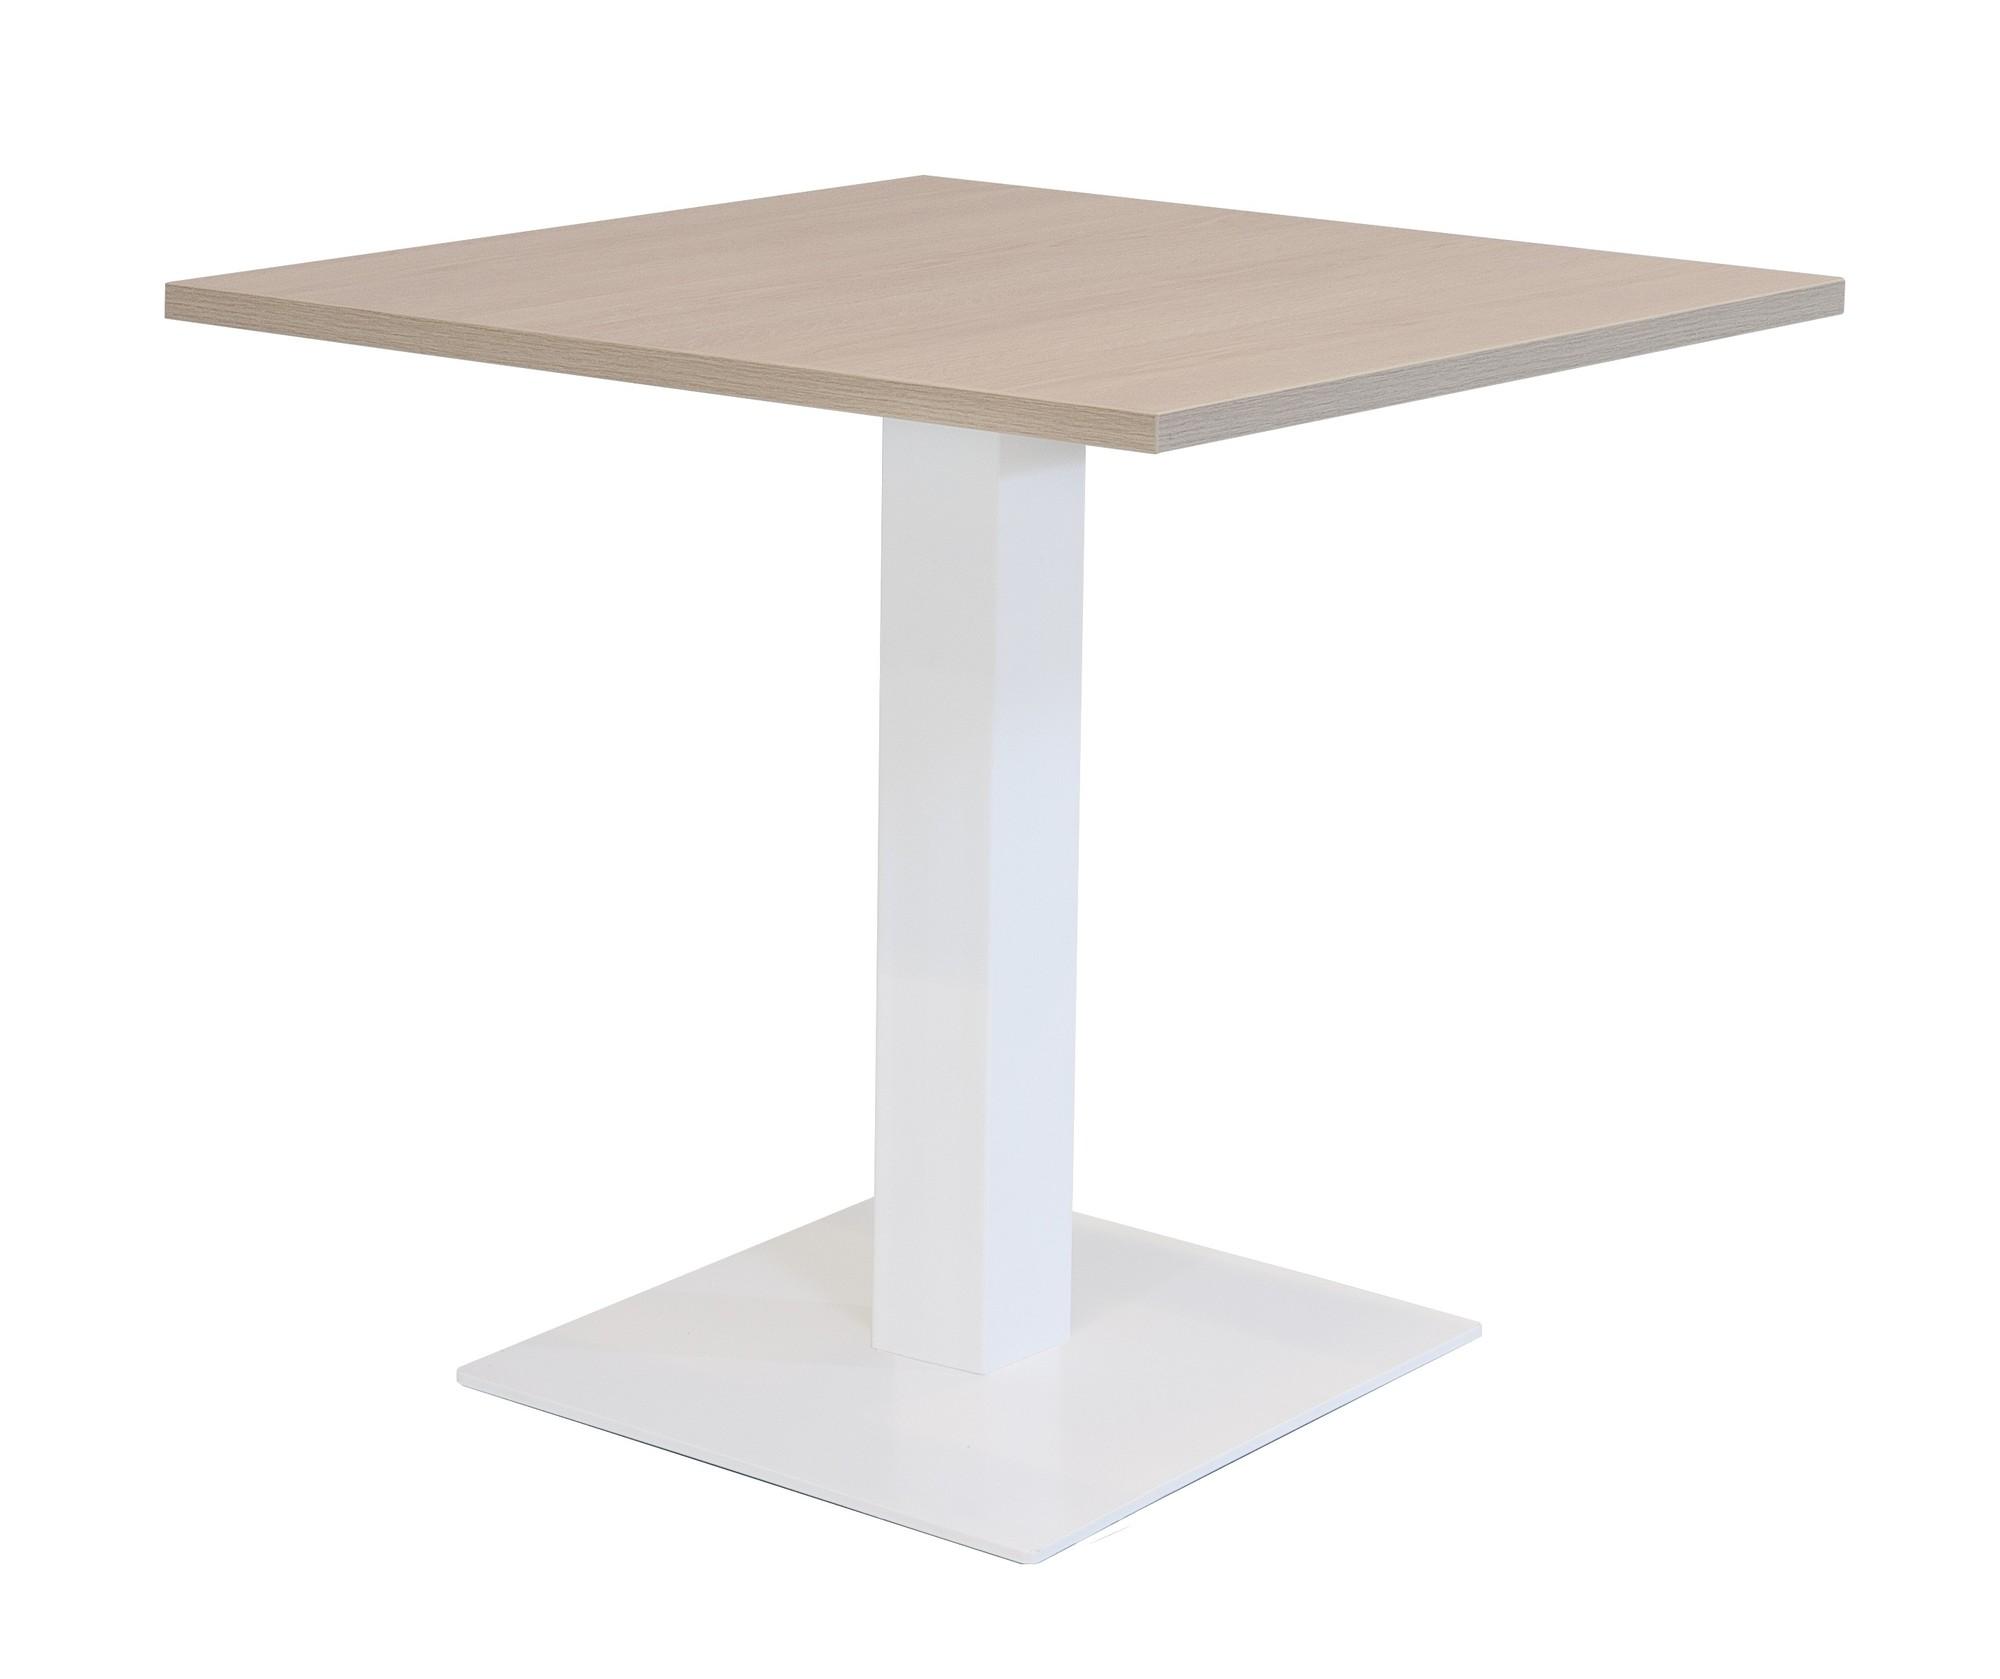 Vierkante Hoge Eettafel.Hoge Kolomtafel Met Vierkante Voet